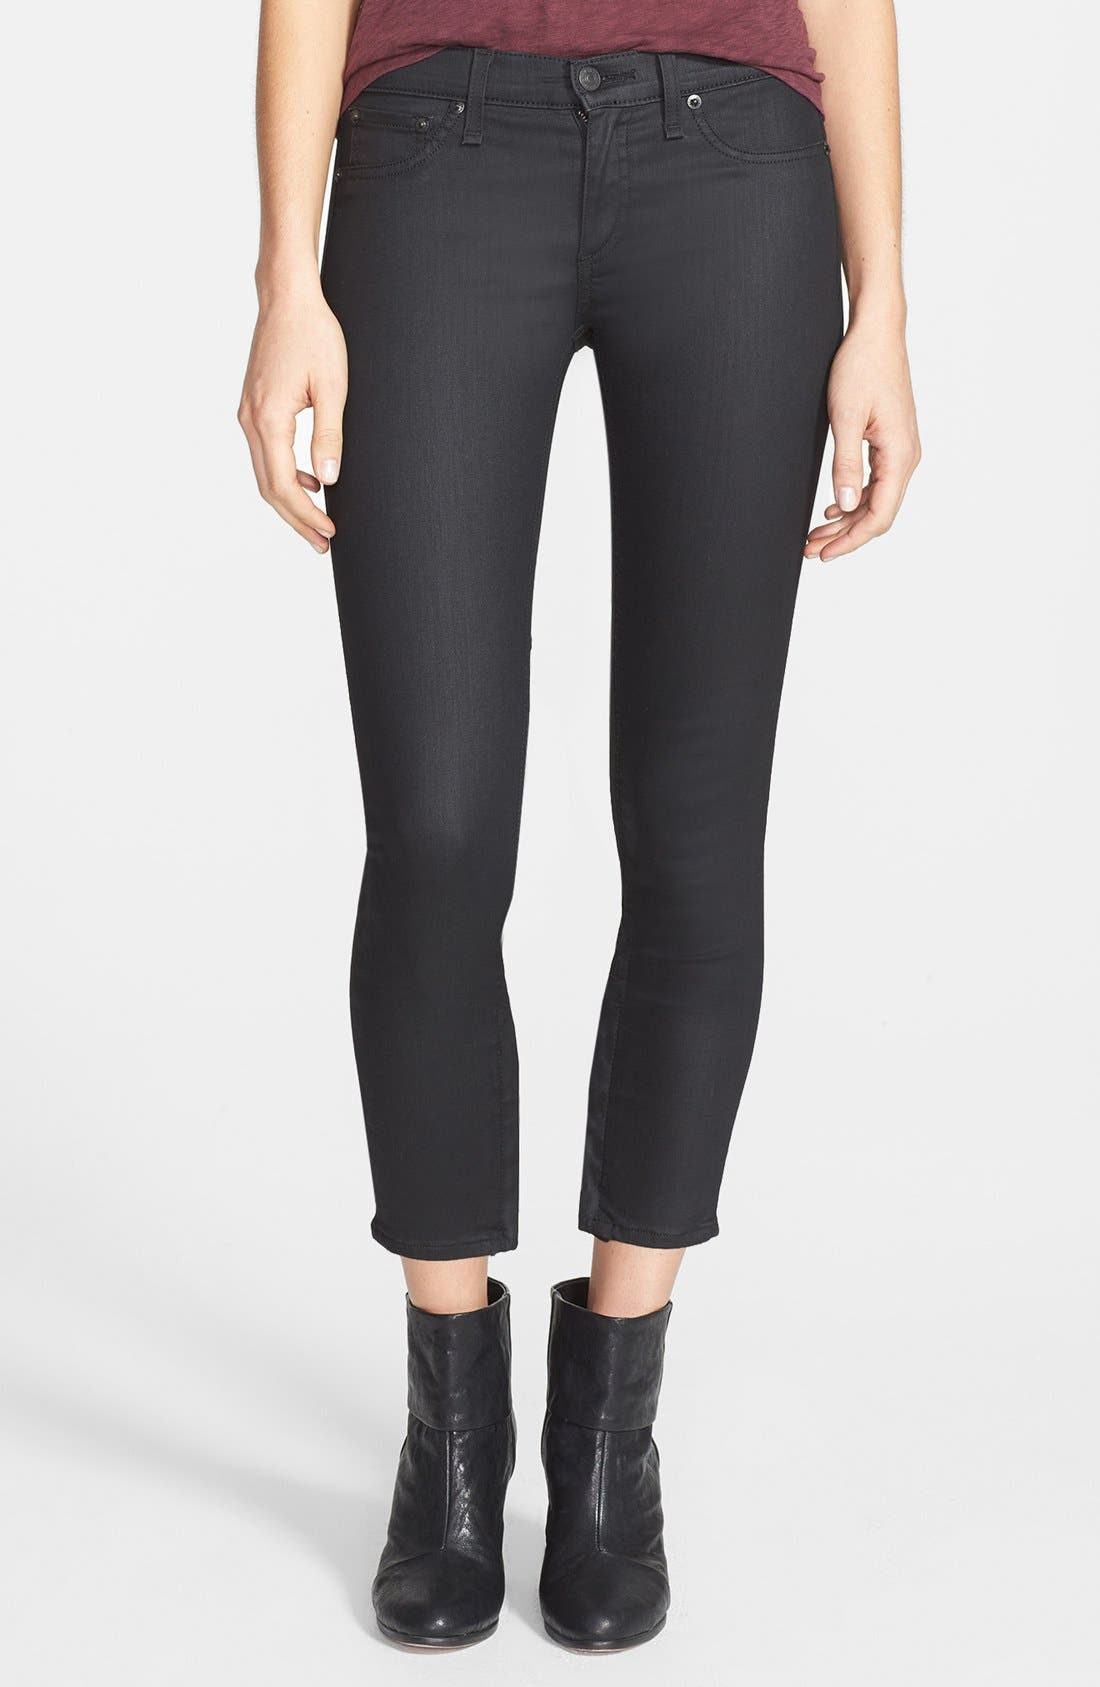 Main Image - rag & bone/JEAN Coated Zip Cuff Crop Jeans (Cotswald)